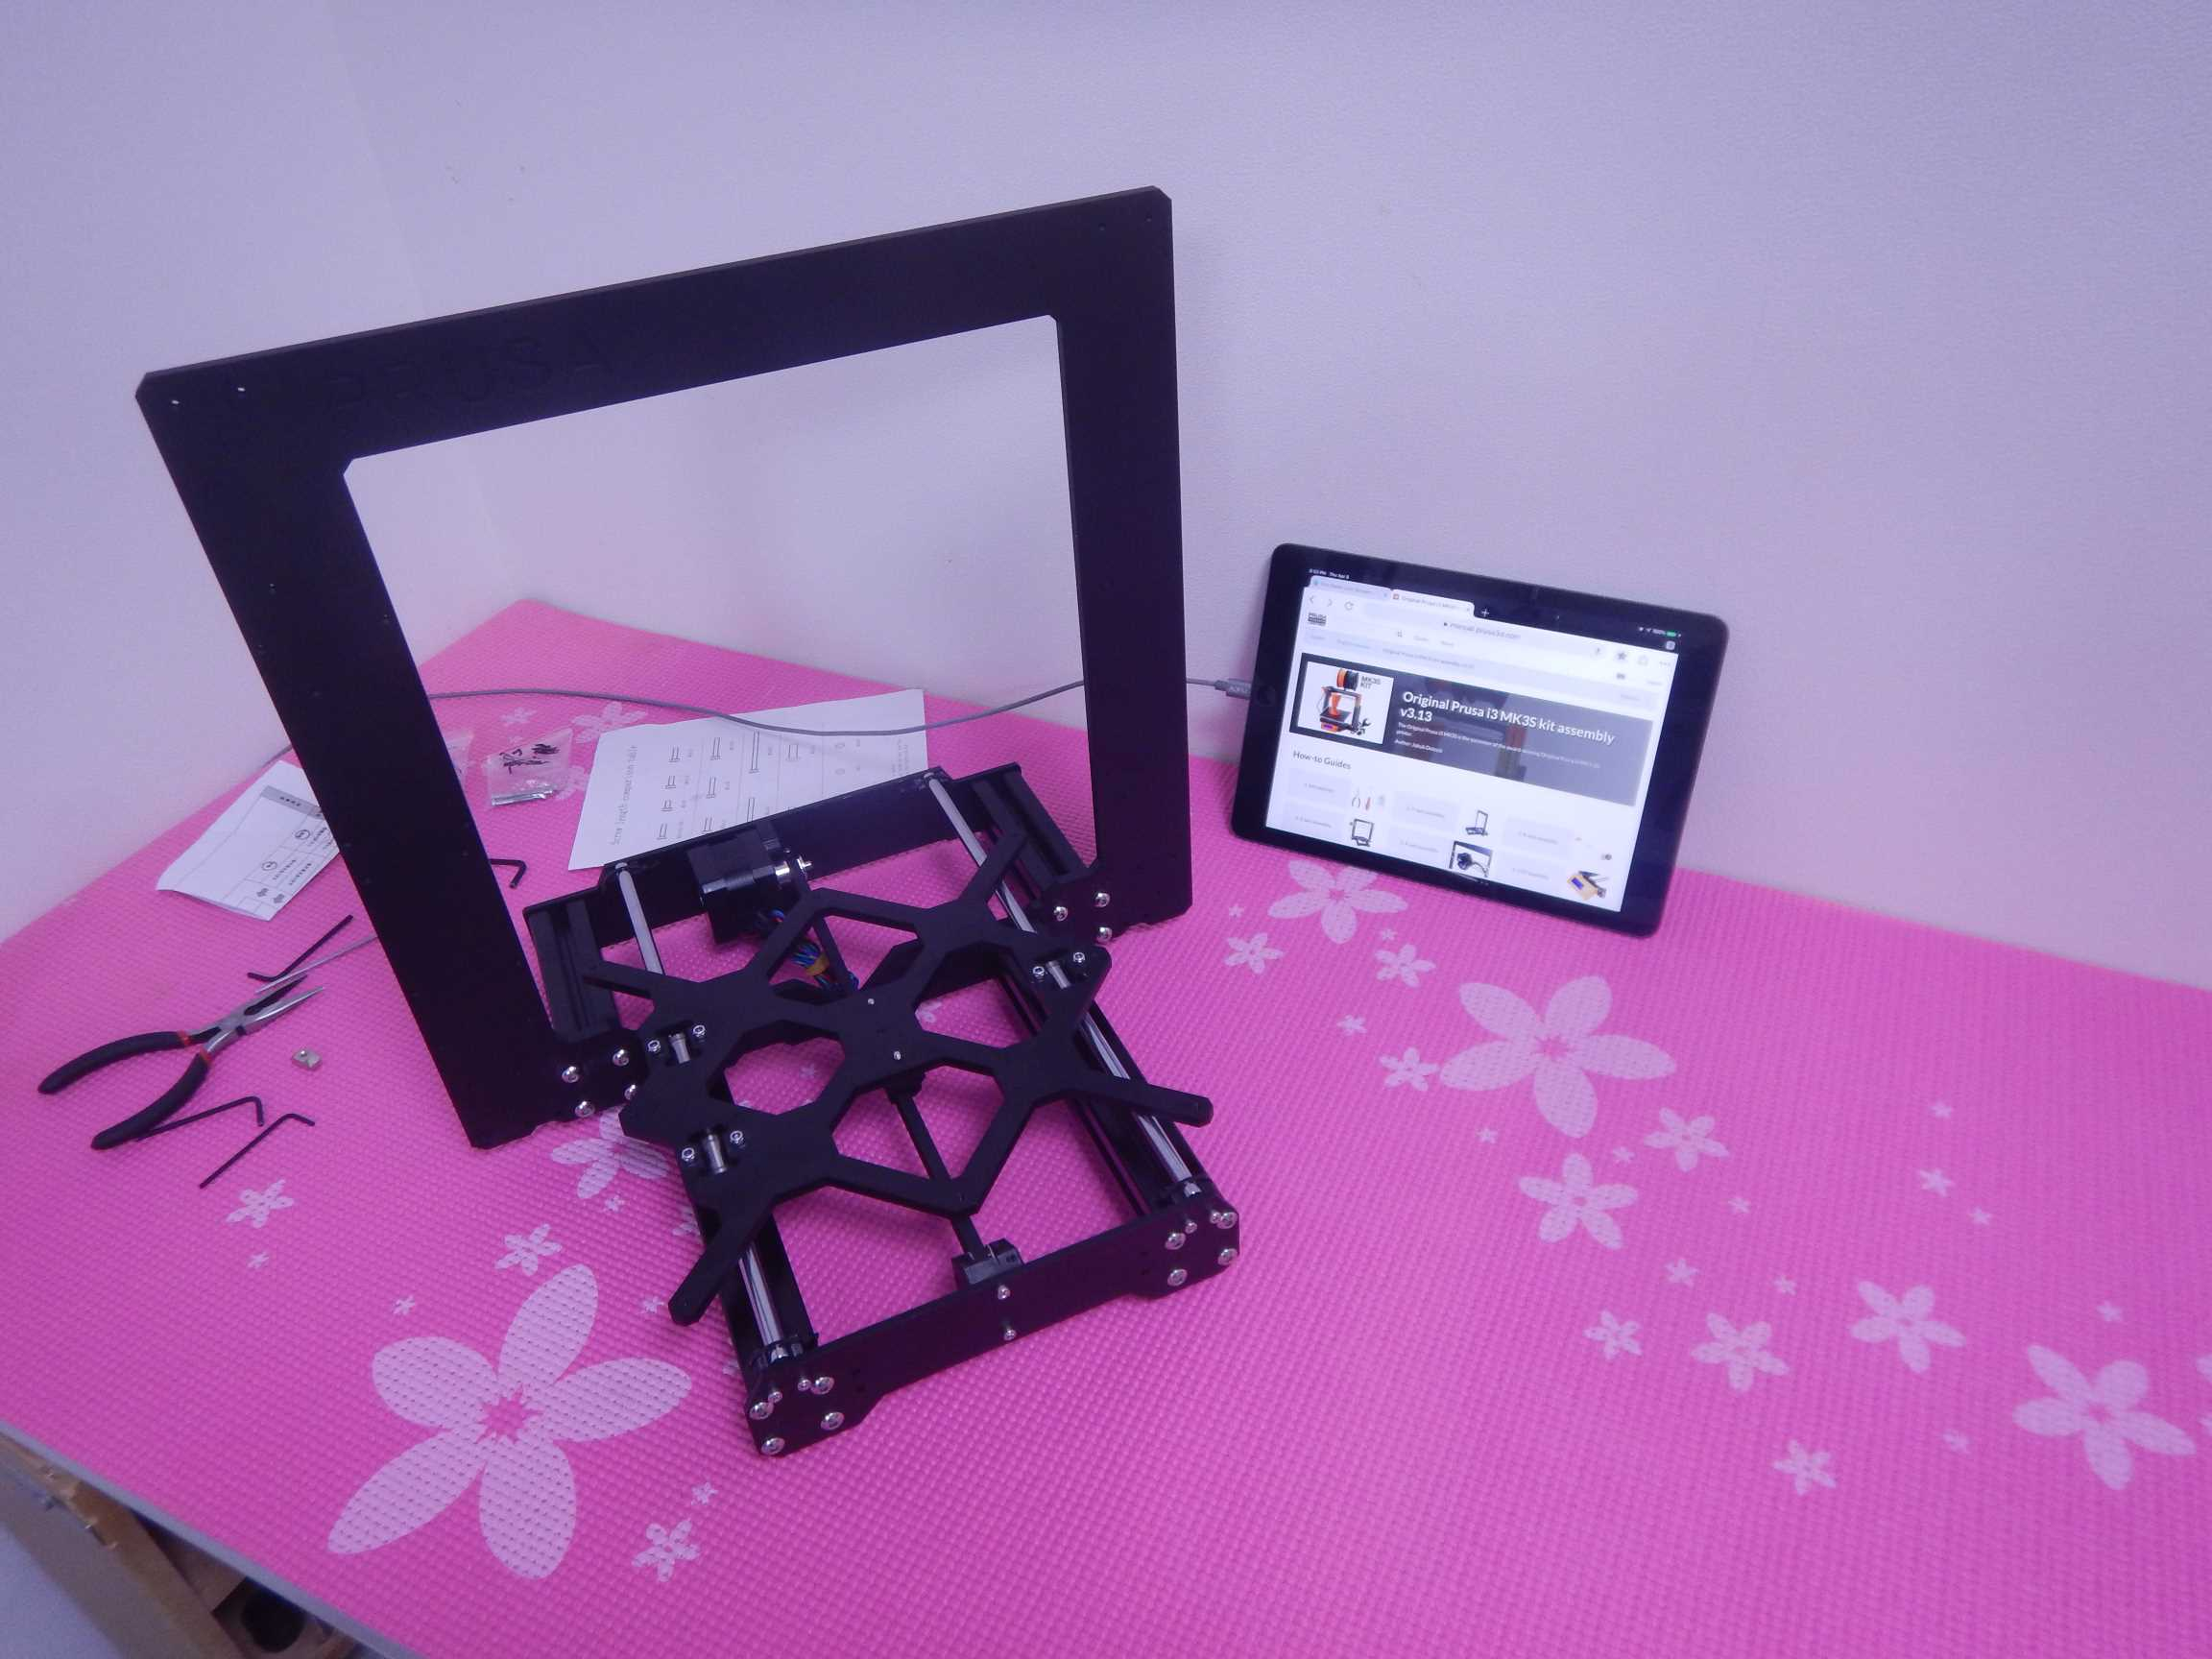 -- Trianglelab Clonado Completo